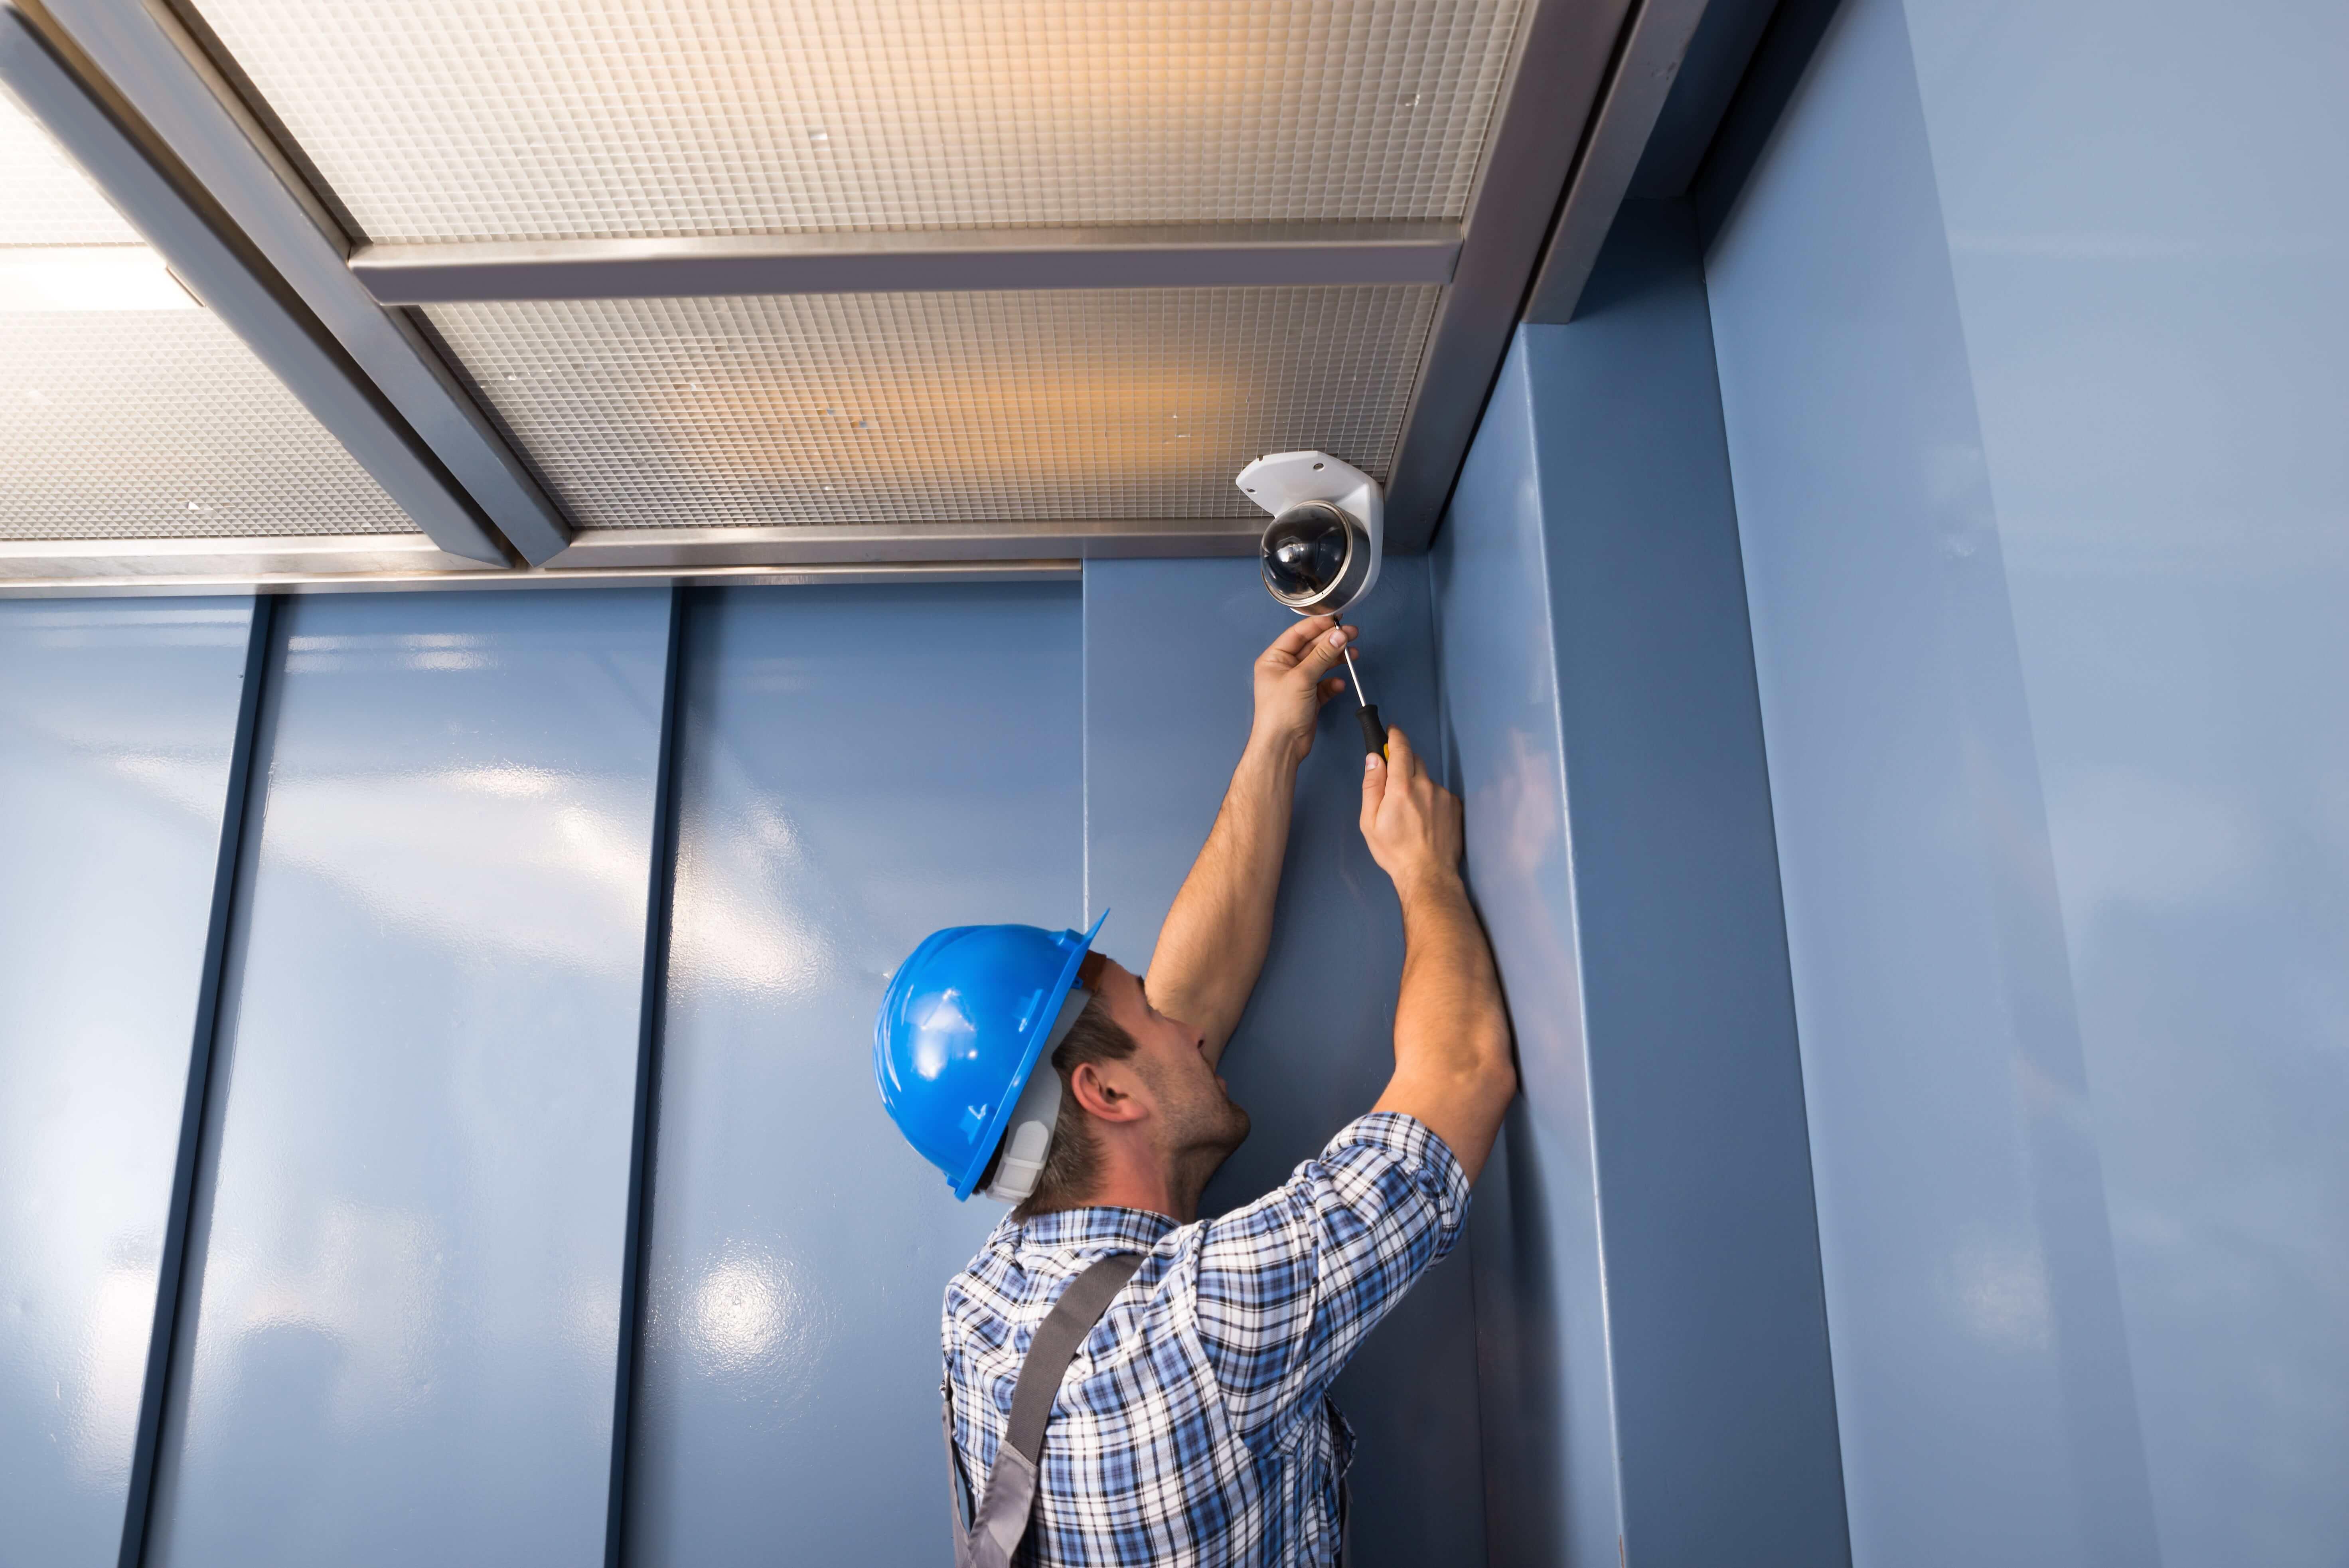 technician working on camera in elevator